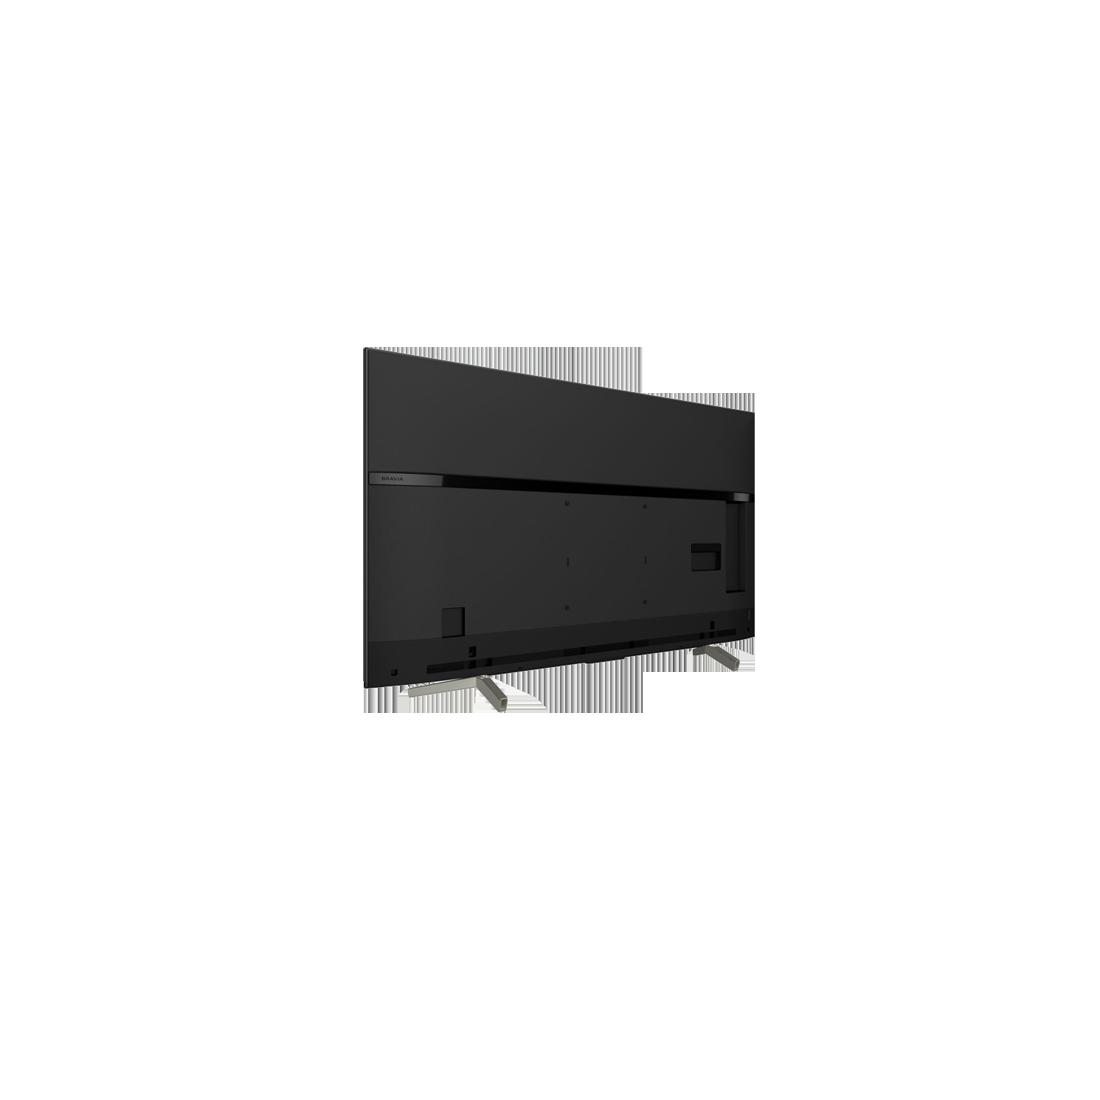 Android Tivi Sony 65 inch KD-65X8500F-Thế giới đồ gia dụng HMD